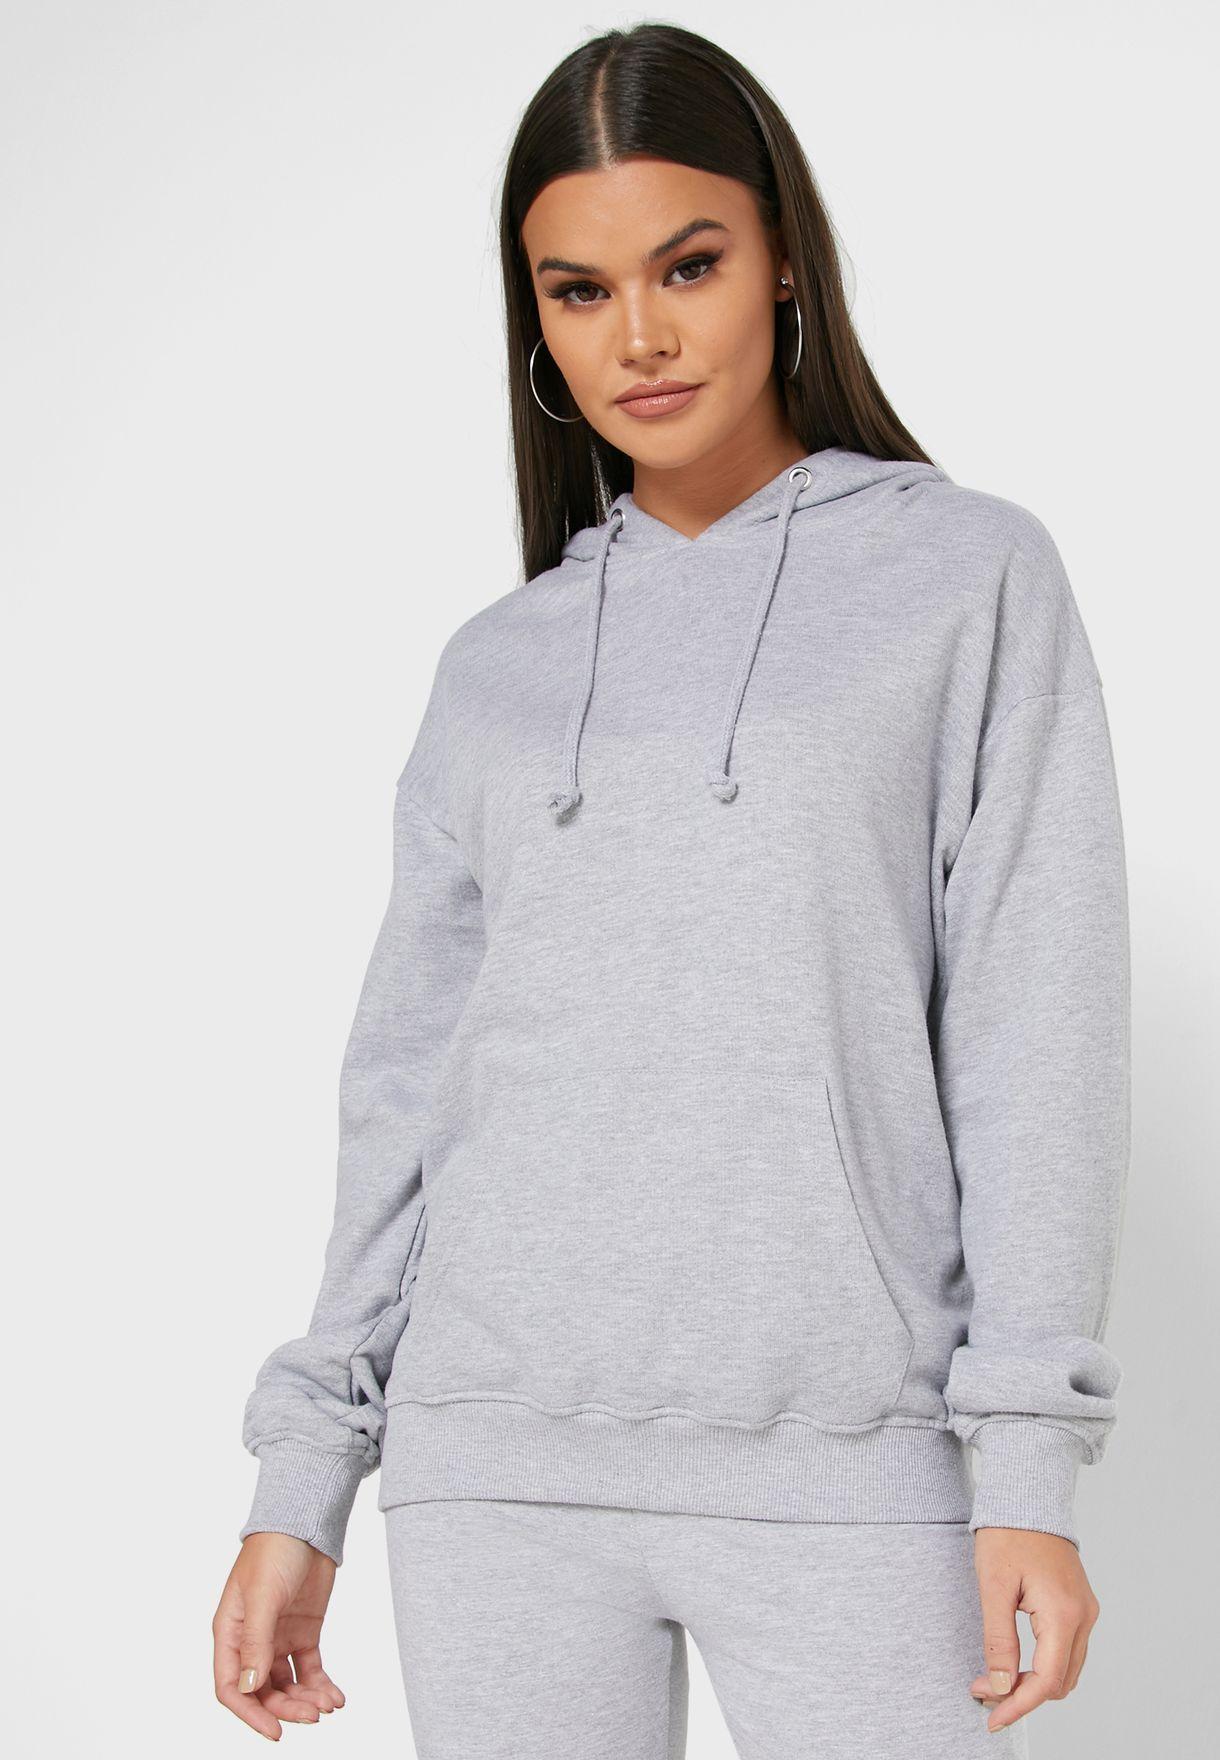 Hooded Sweatshirt & Shorts Set